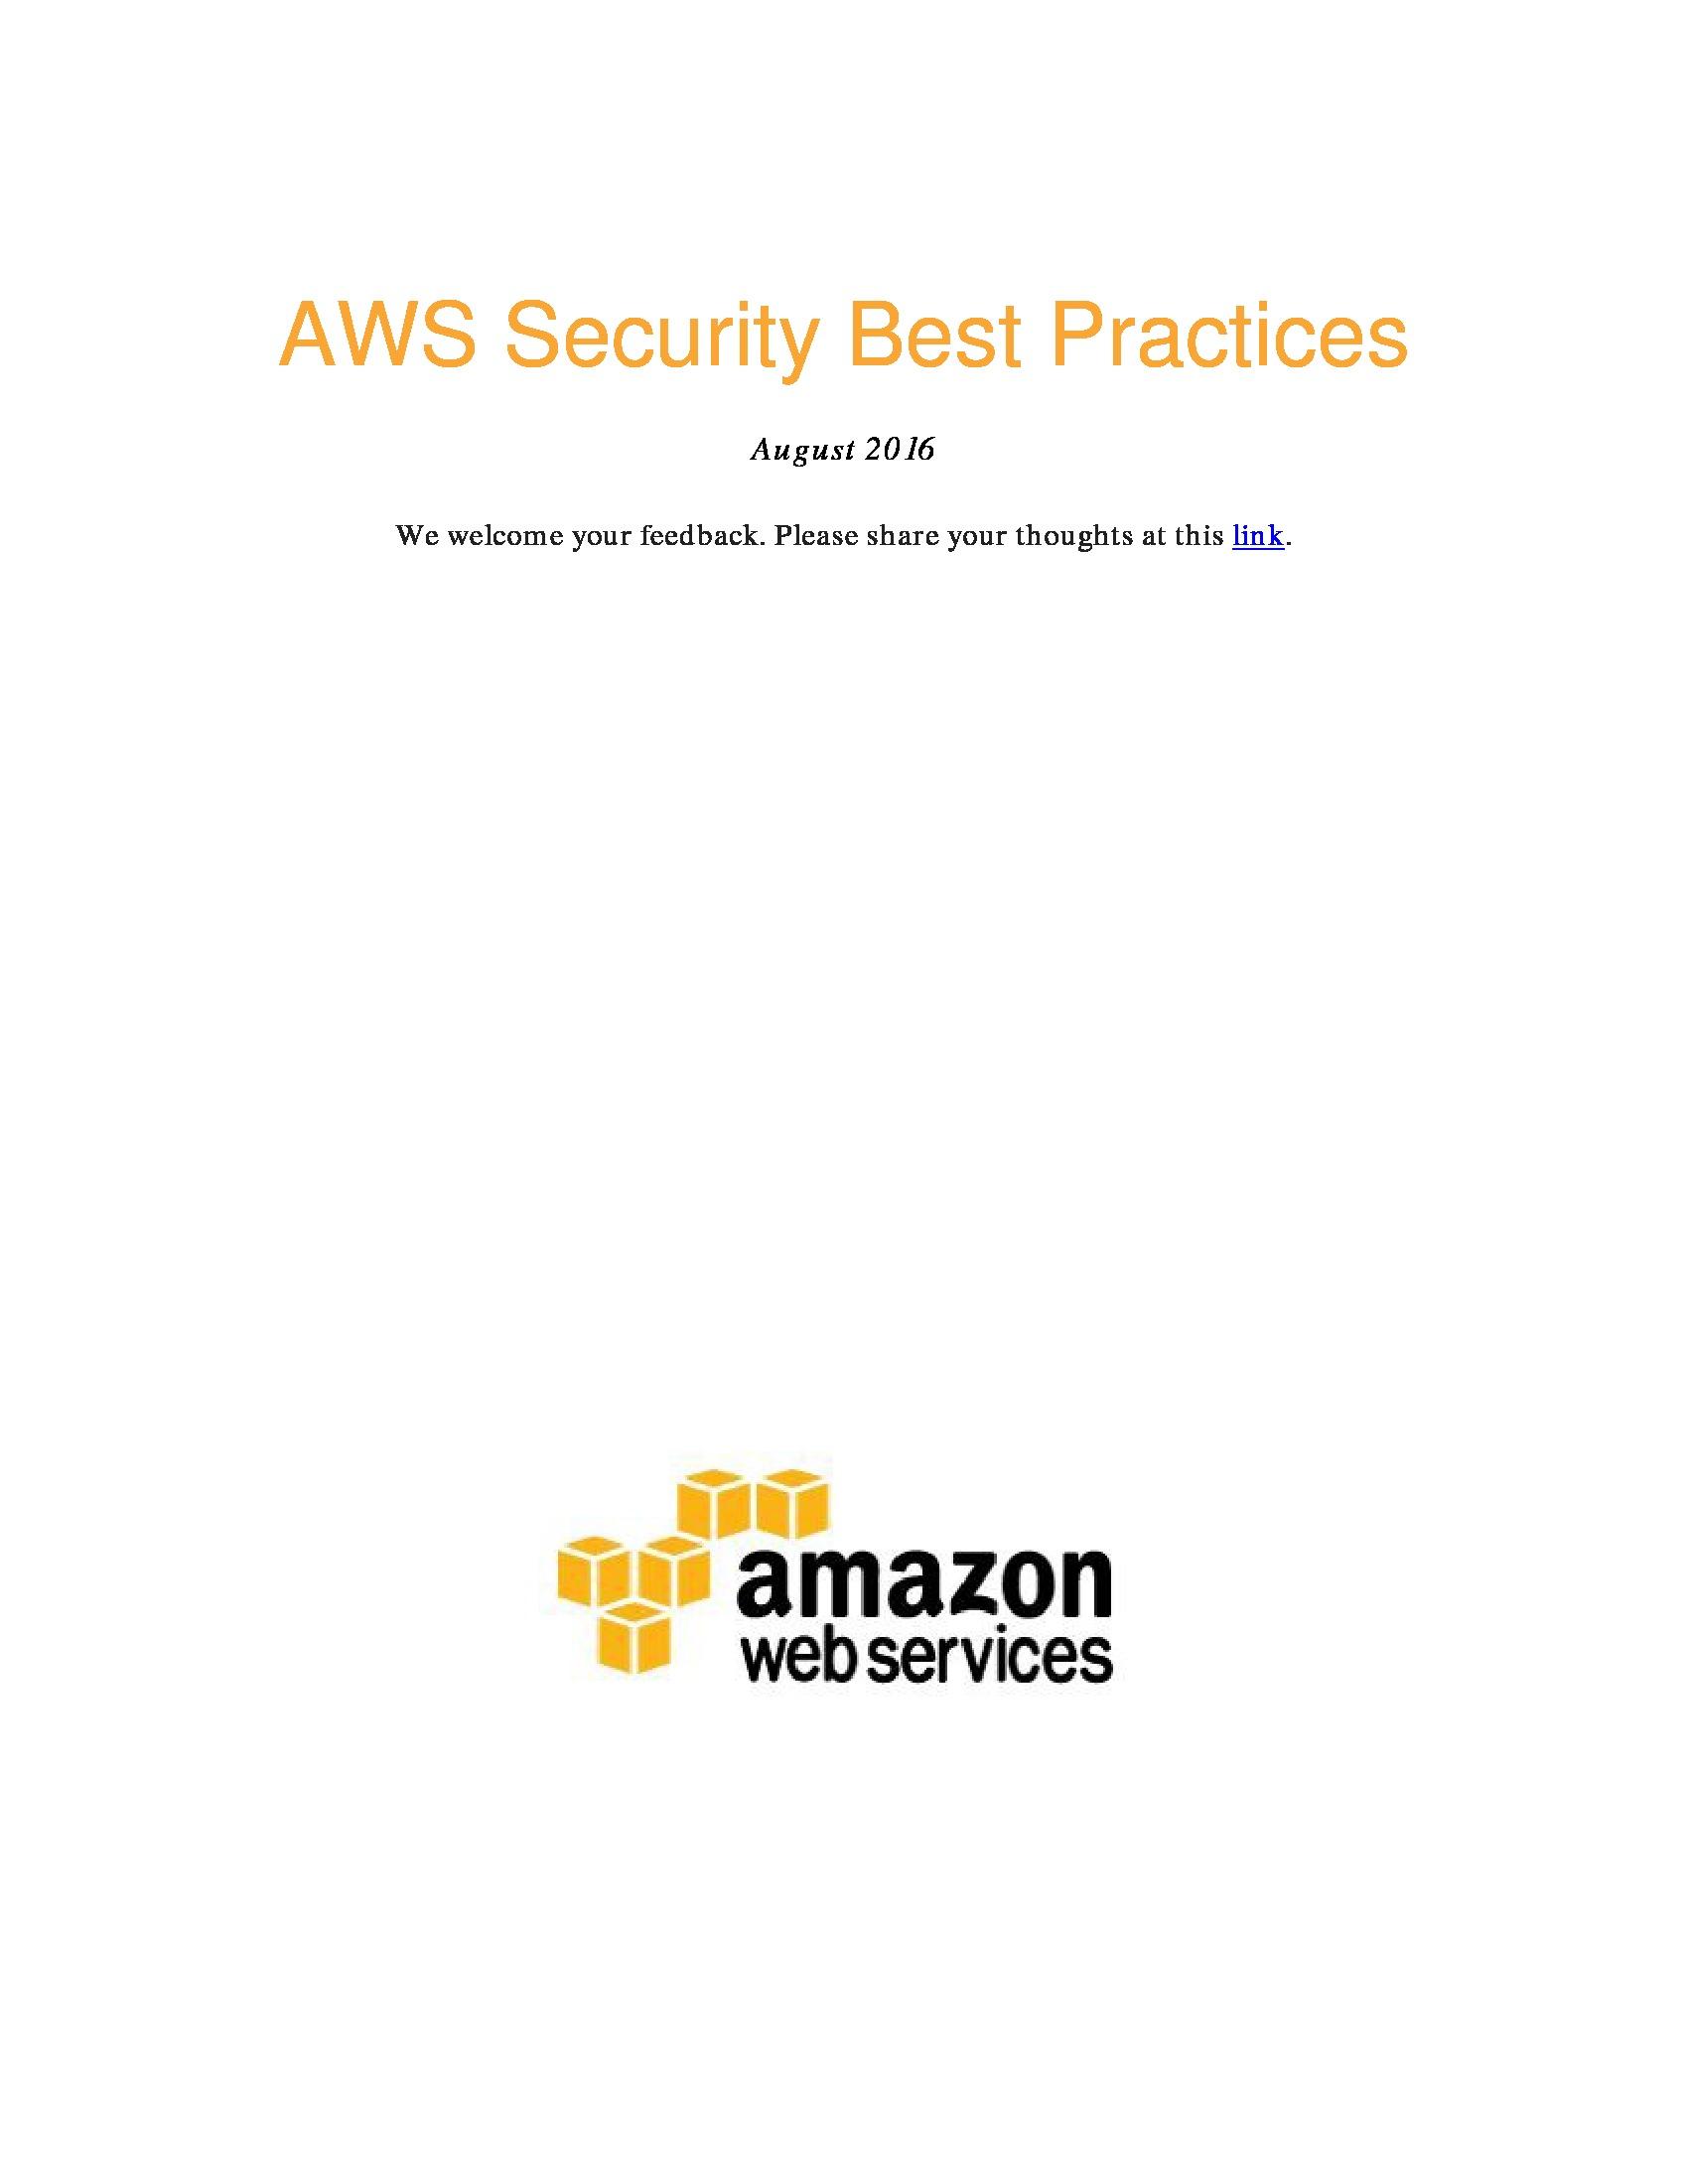 GT - Amazon - 2019 Microsite - AWS Security Best Practices